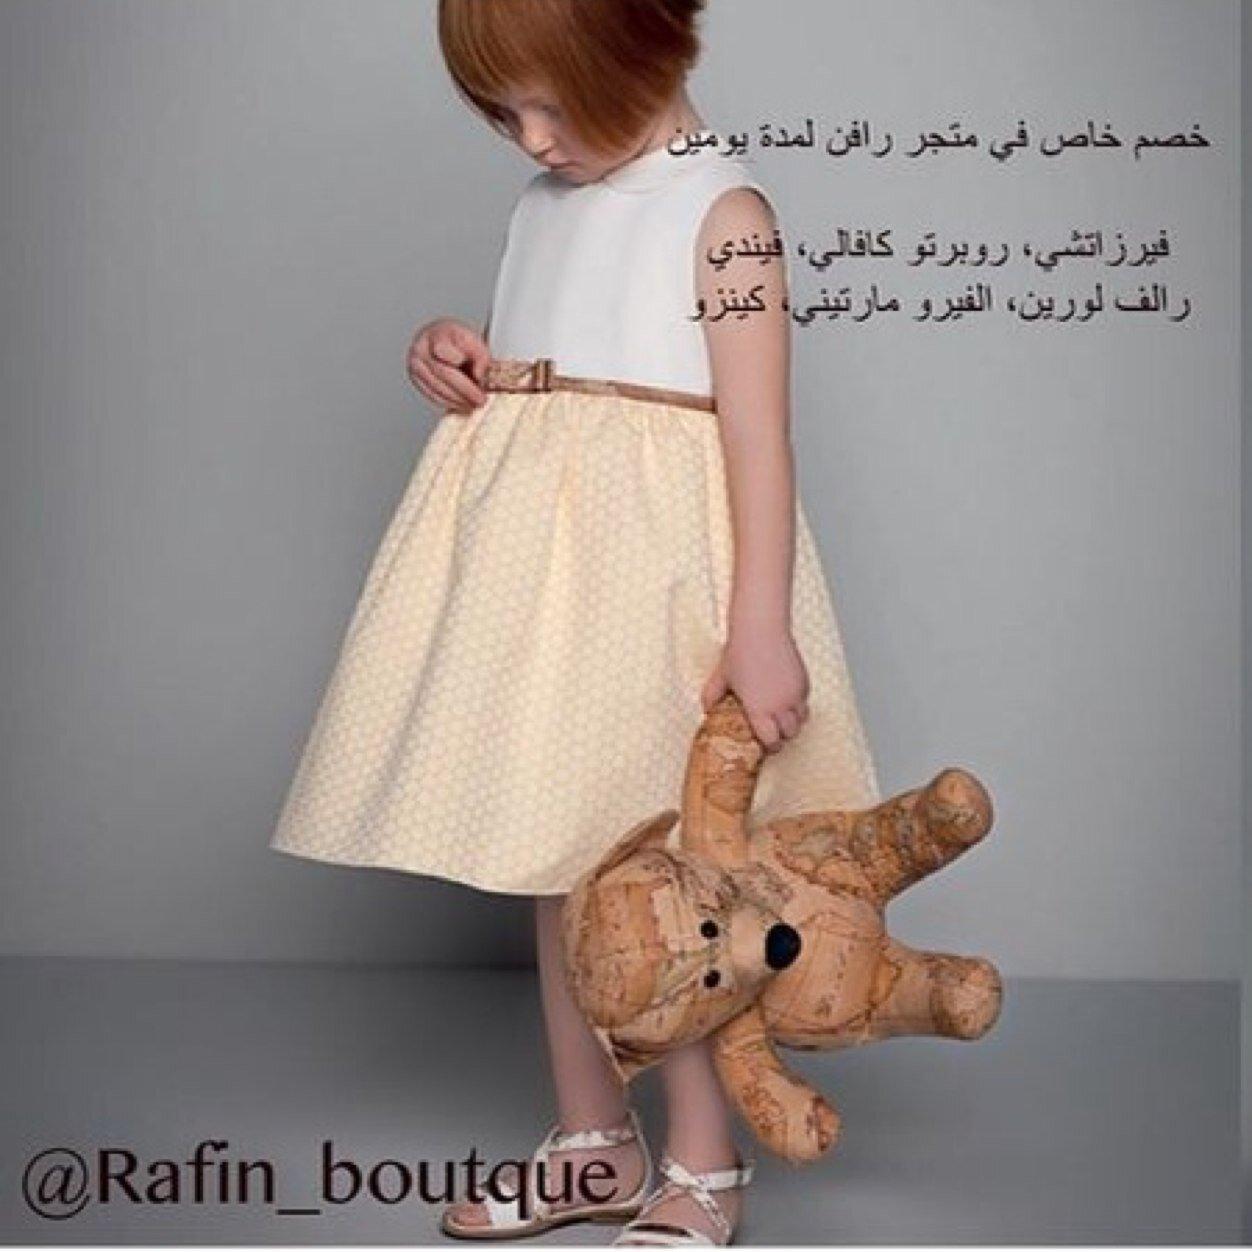 80b71fab6 ملابس أطفال ماركات (@RAFIN_BOUTQUE) | Twitter